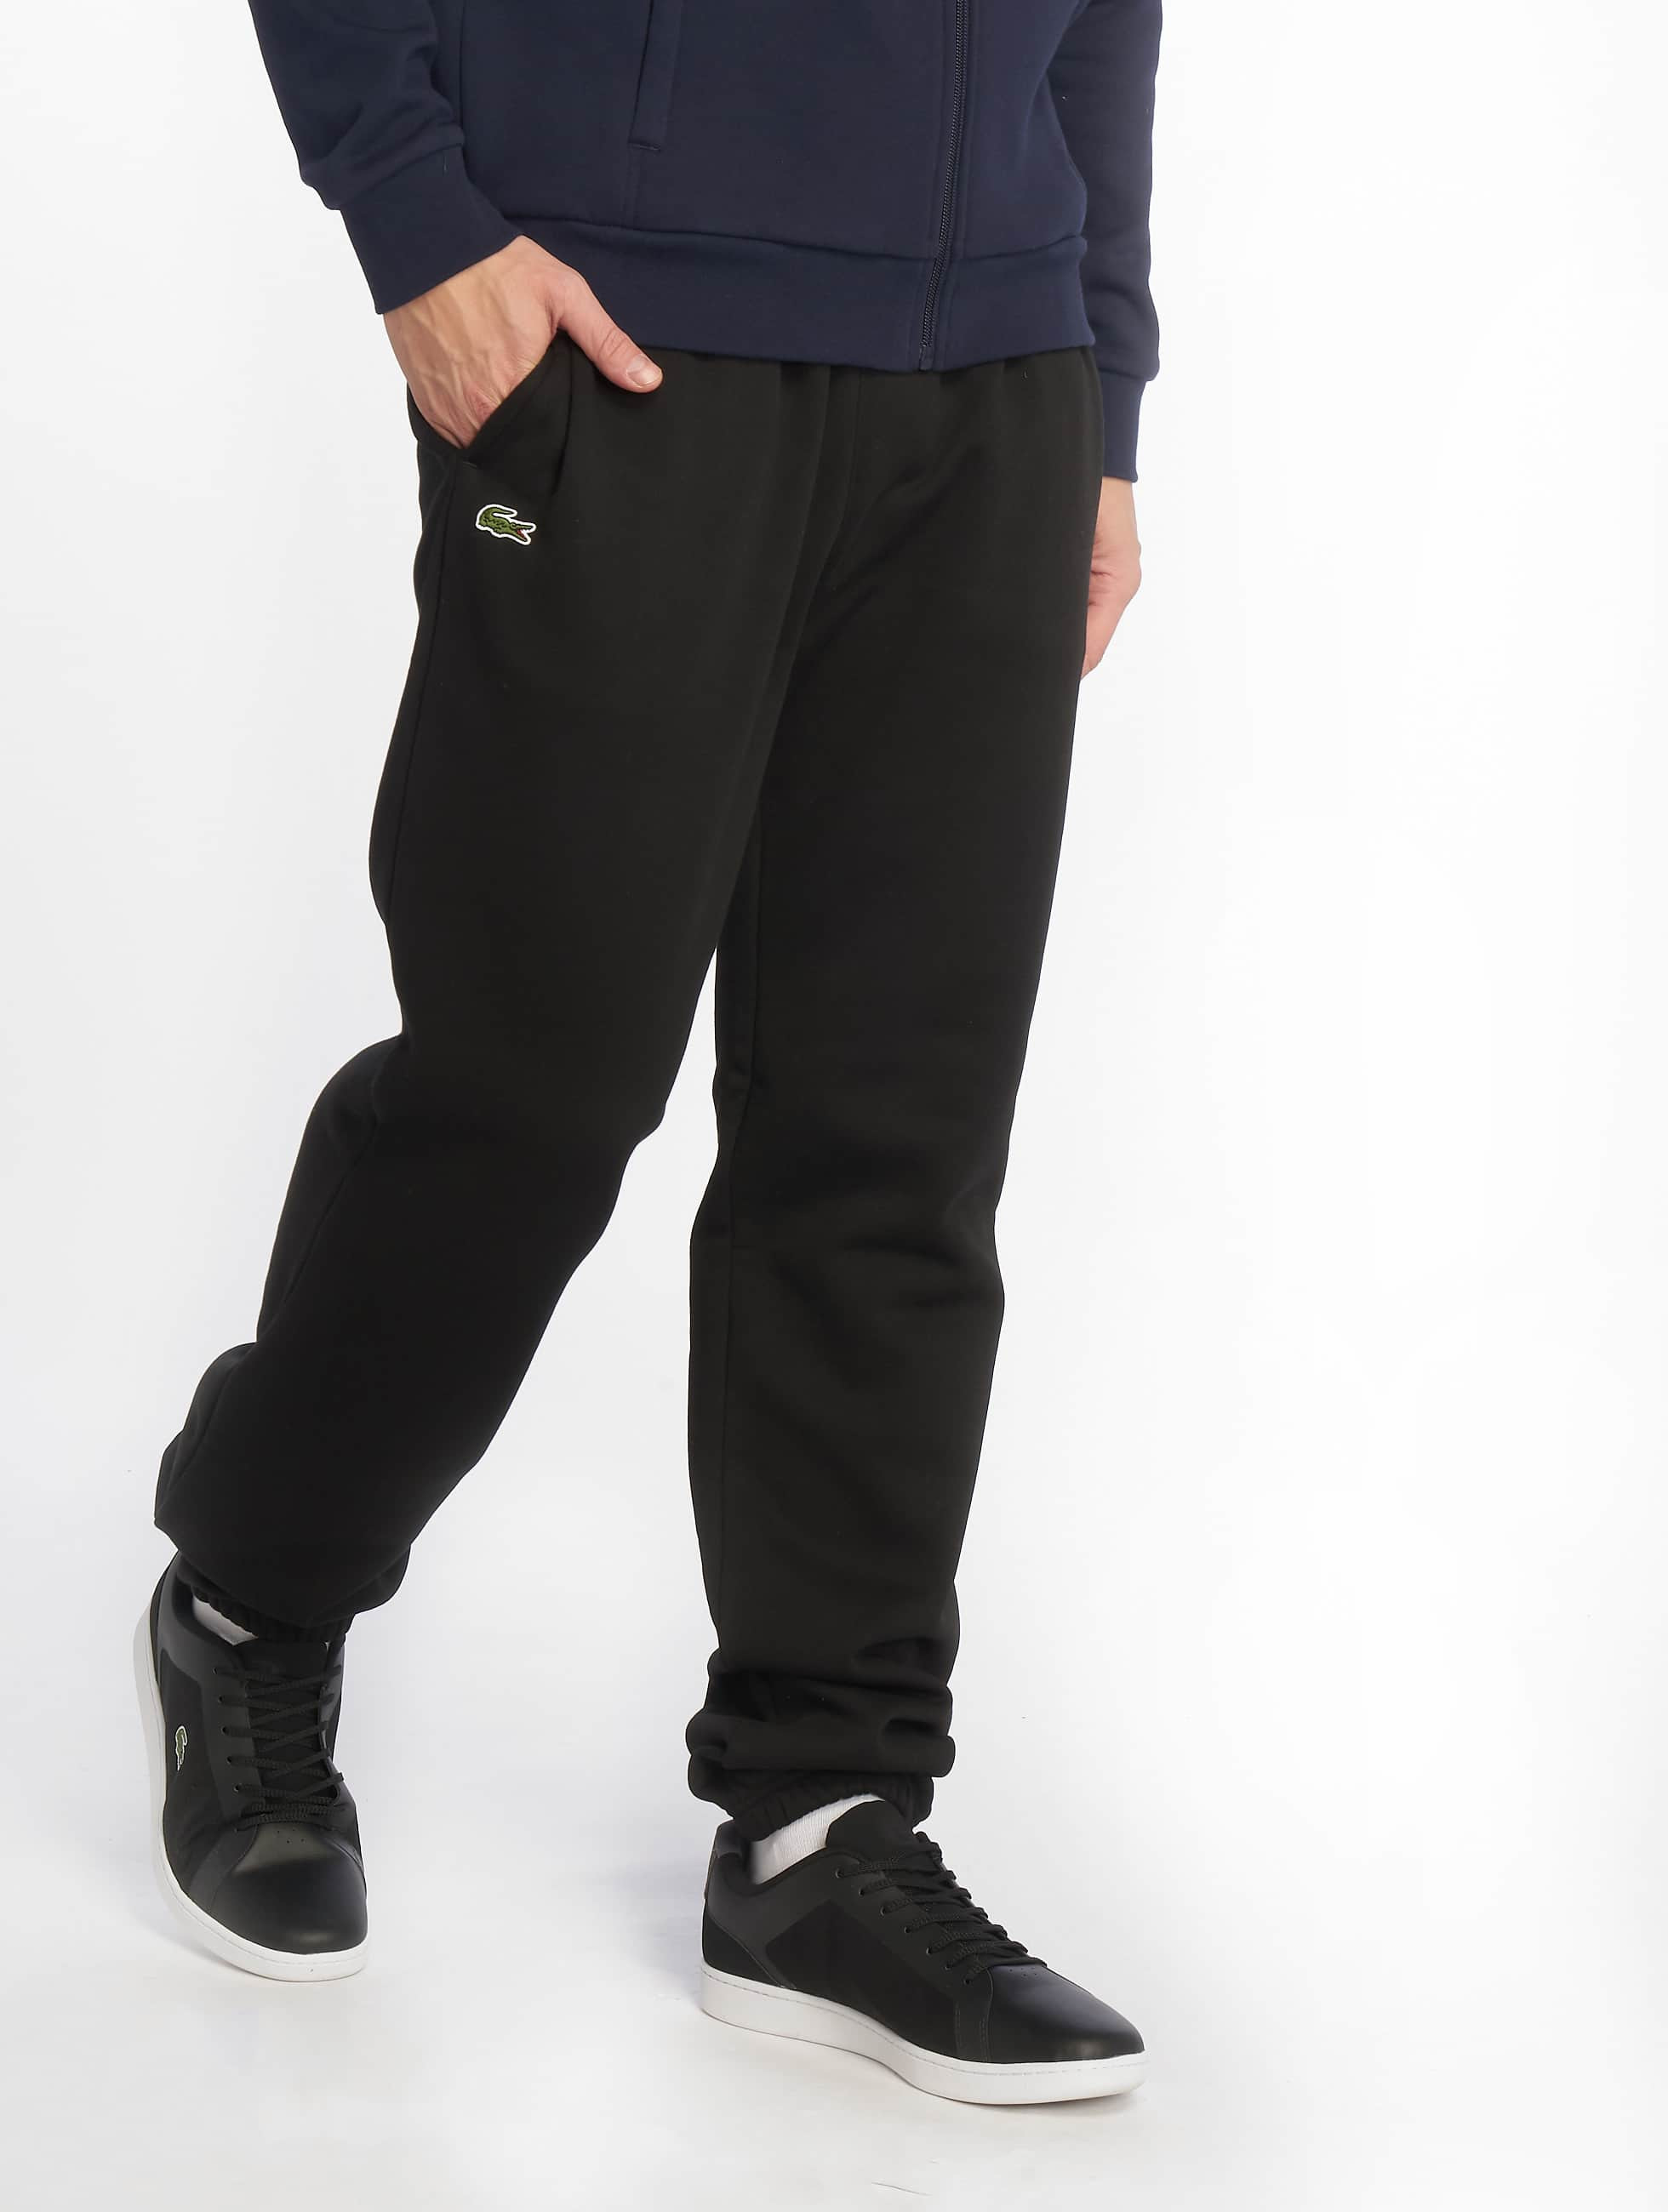 lacoste herren jogginghose classic in schwarz 210770. Black Bedroom Furniture Sets. Home Design Ideas